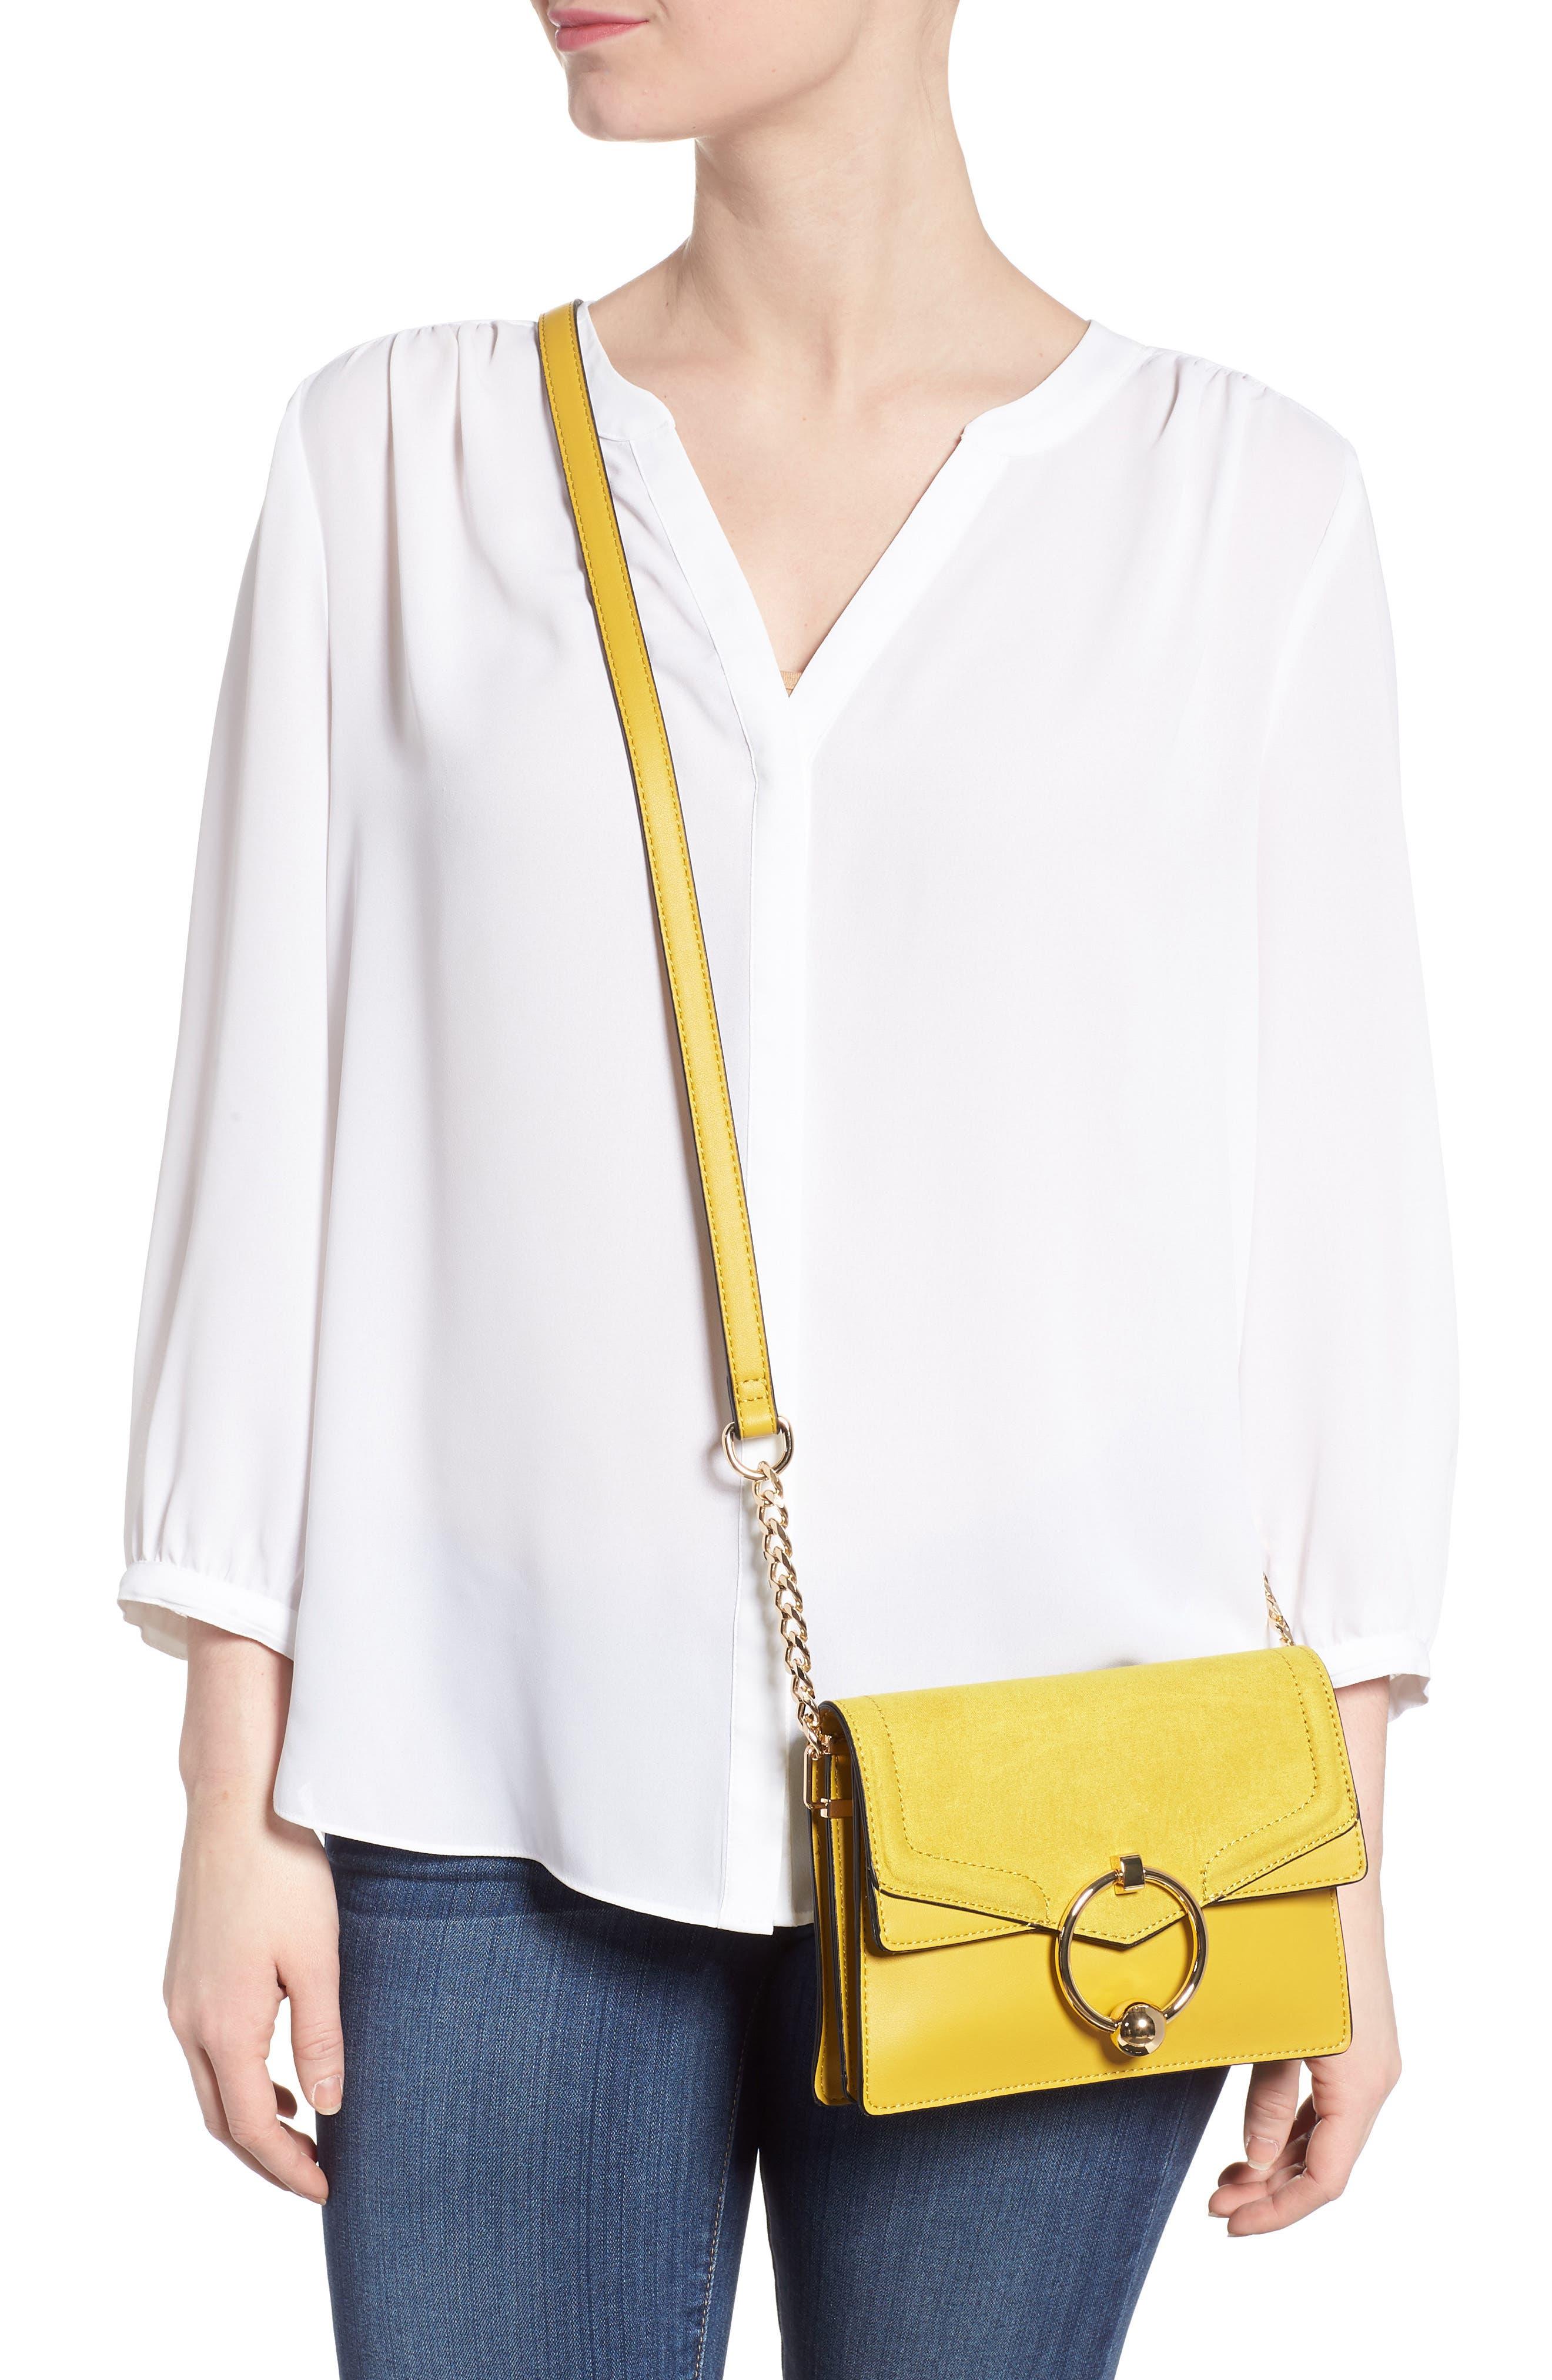 Seline Faux Leather Crossbody Bag,                             Alternate thumbnail 2, color,                             Yellow Multi